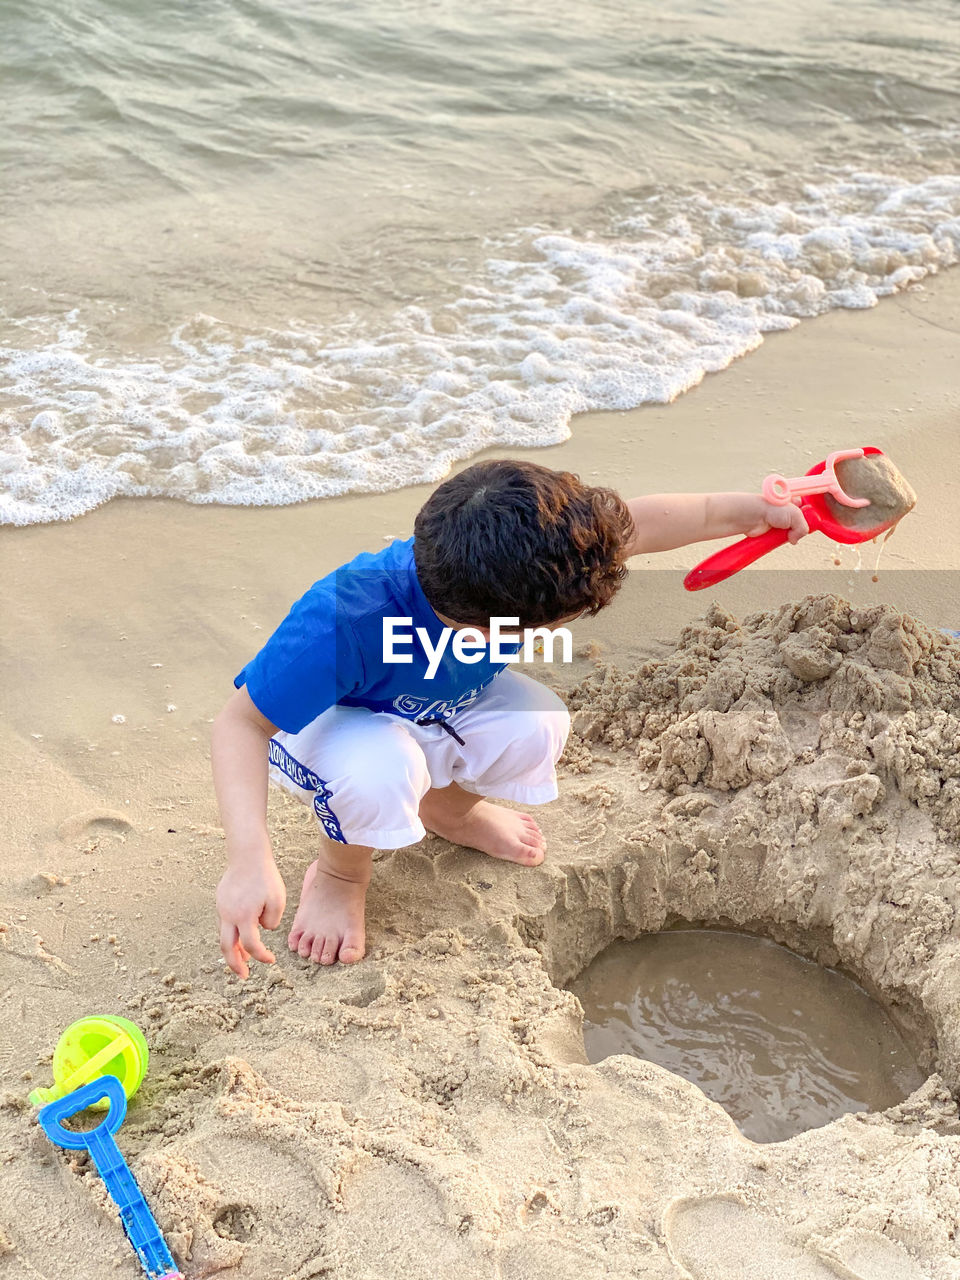 BOY ON SHORE AT BEACH